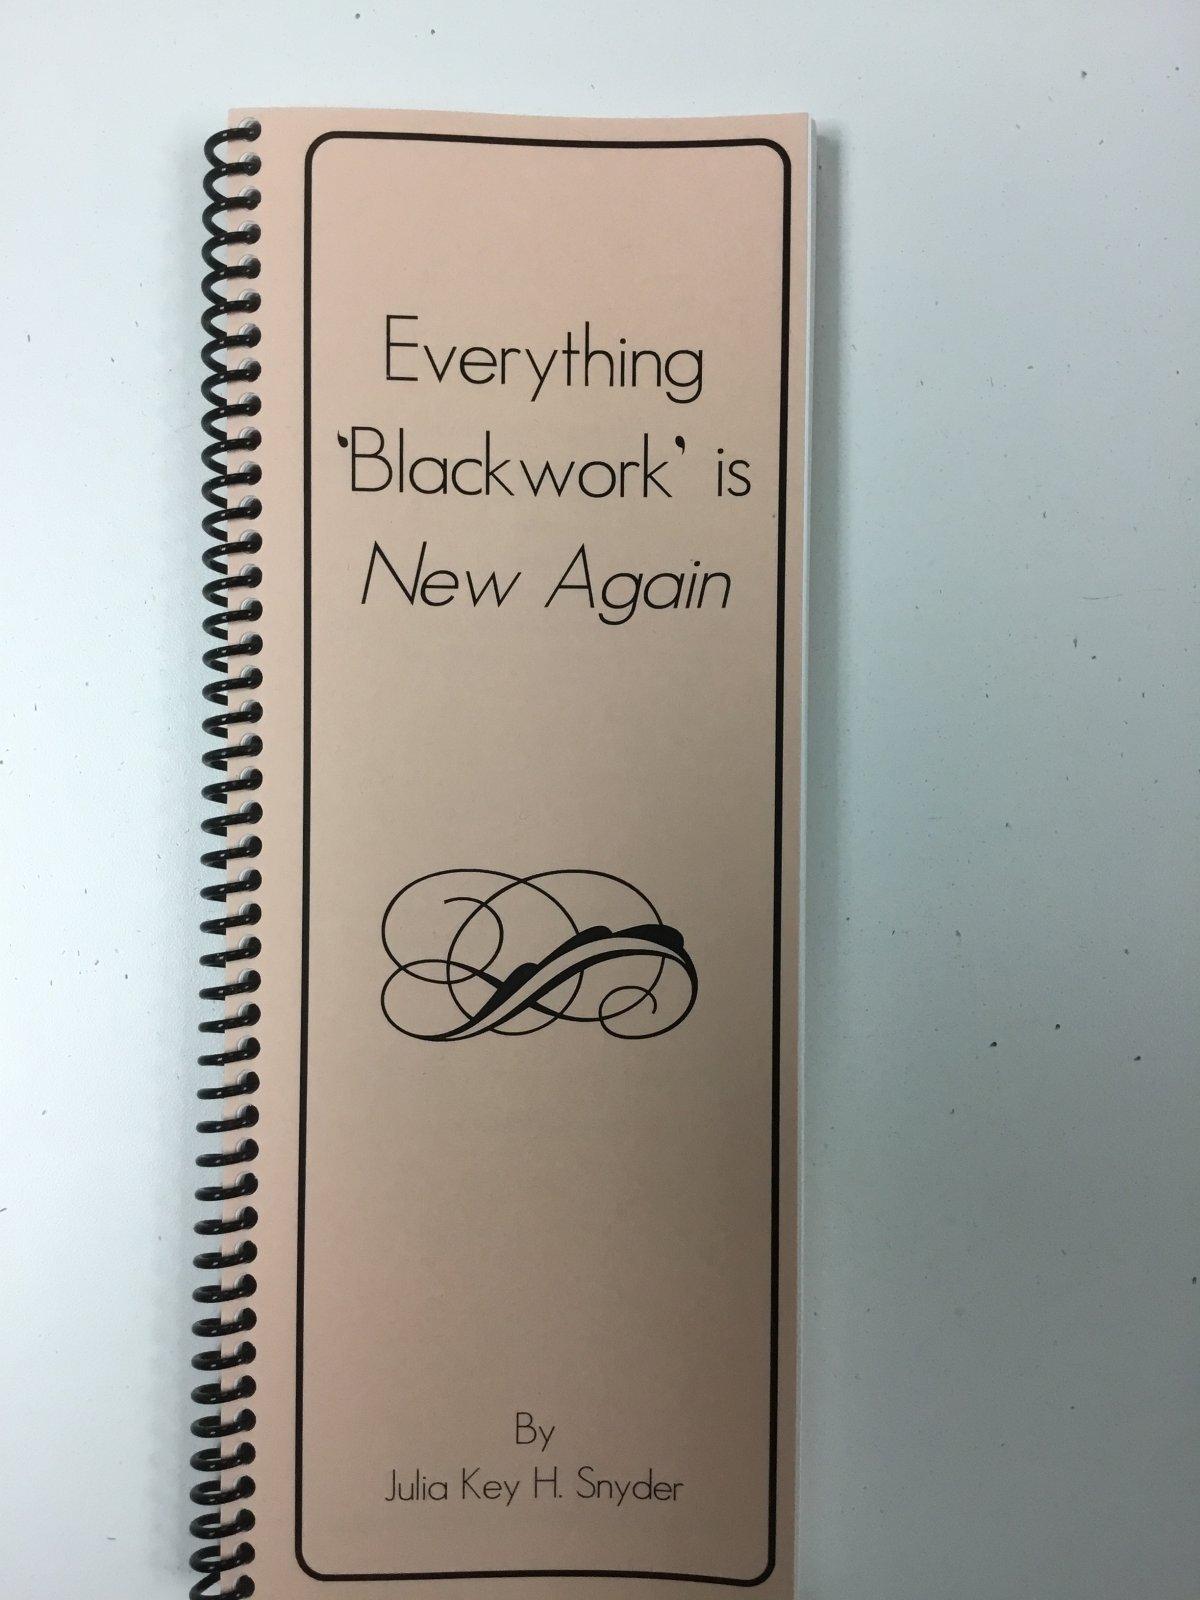 Everything Blackwork is New Again